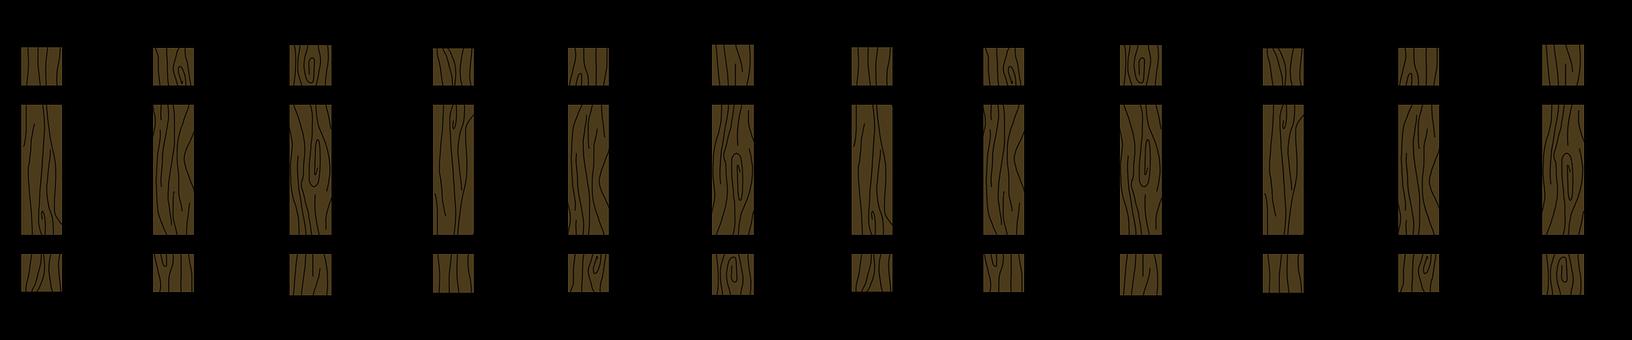 Railroad, Tracks, Wood, Wooden Tracks, Railway, Rail